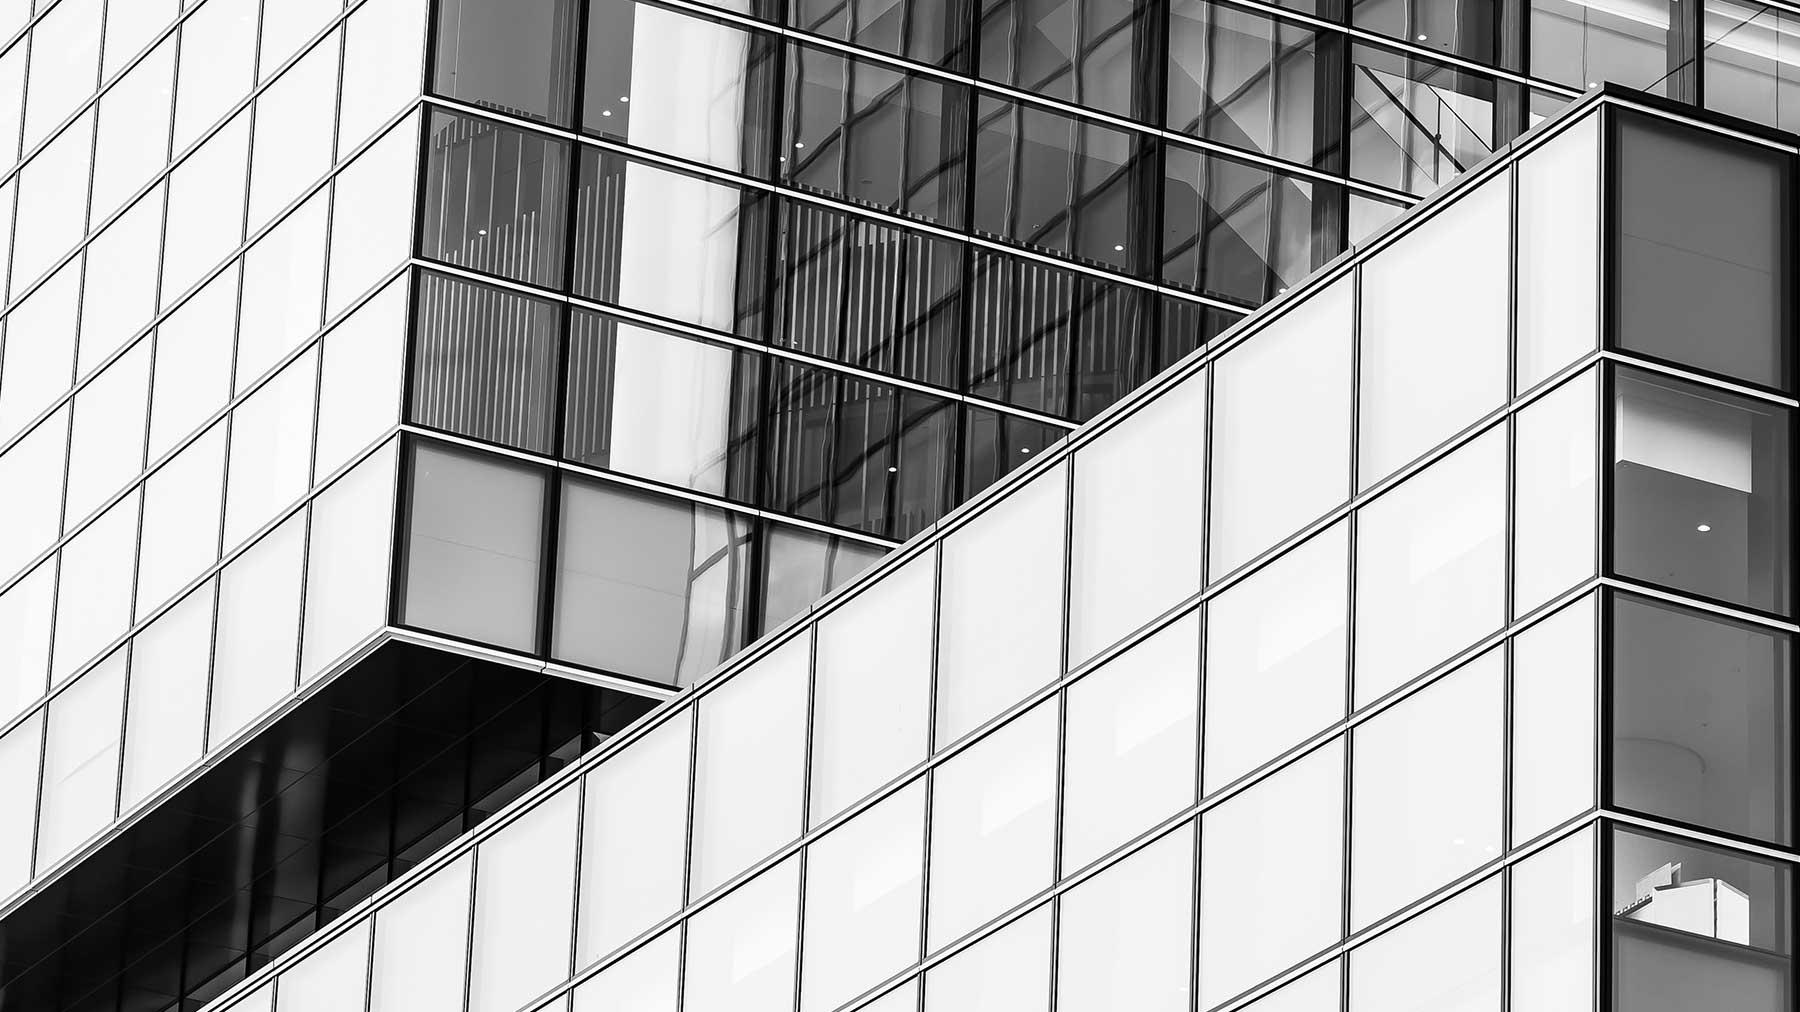 Curso-Online-de-Fotografia-de-Arquitectura